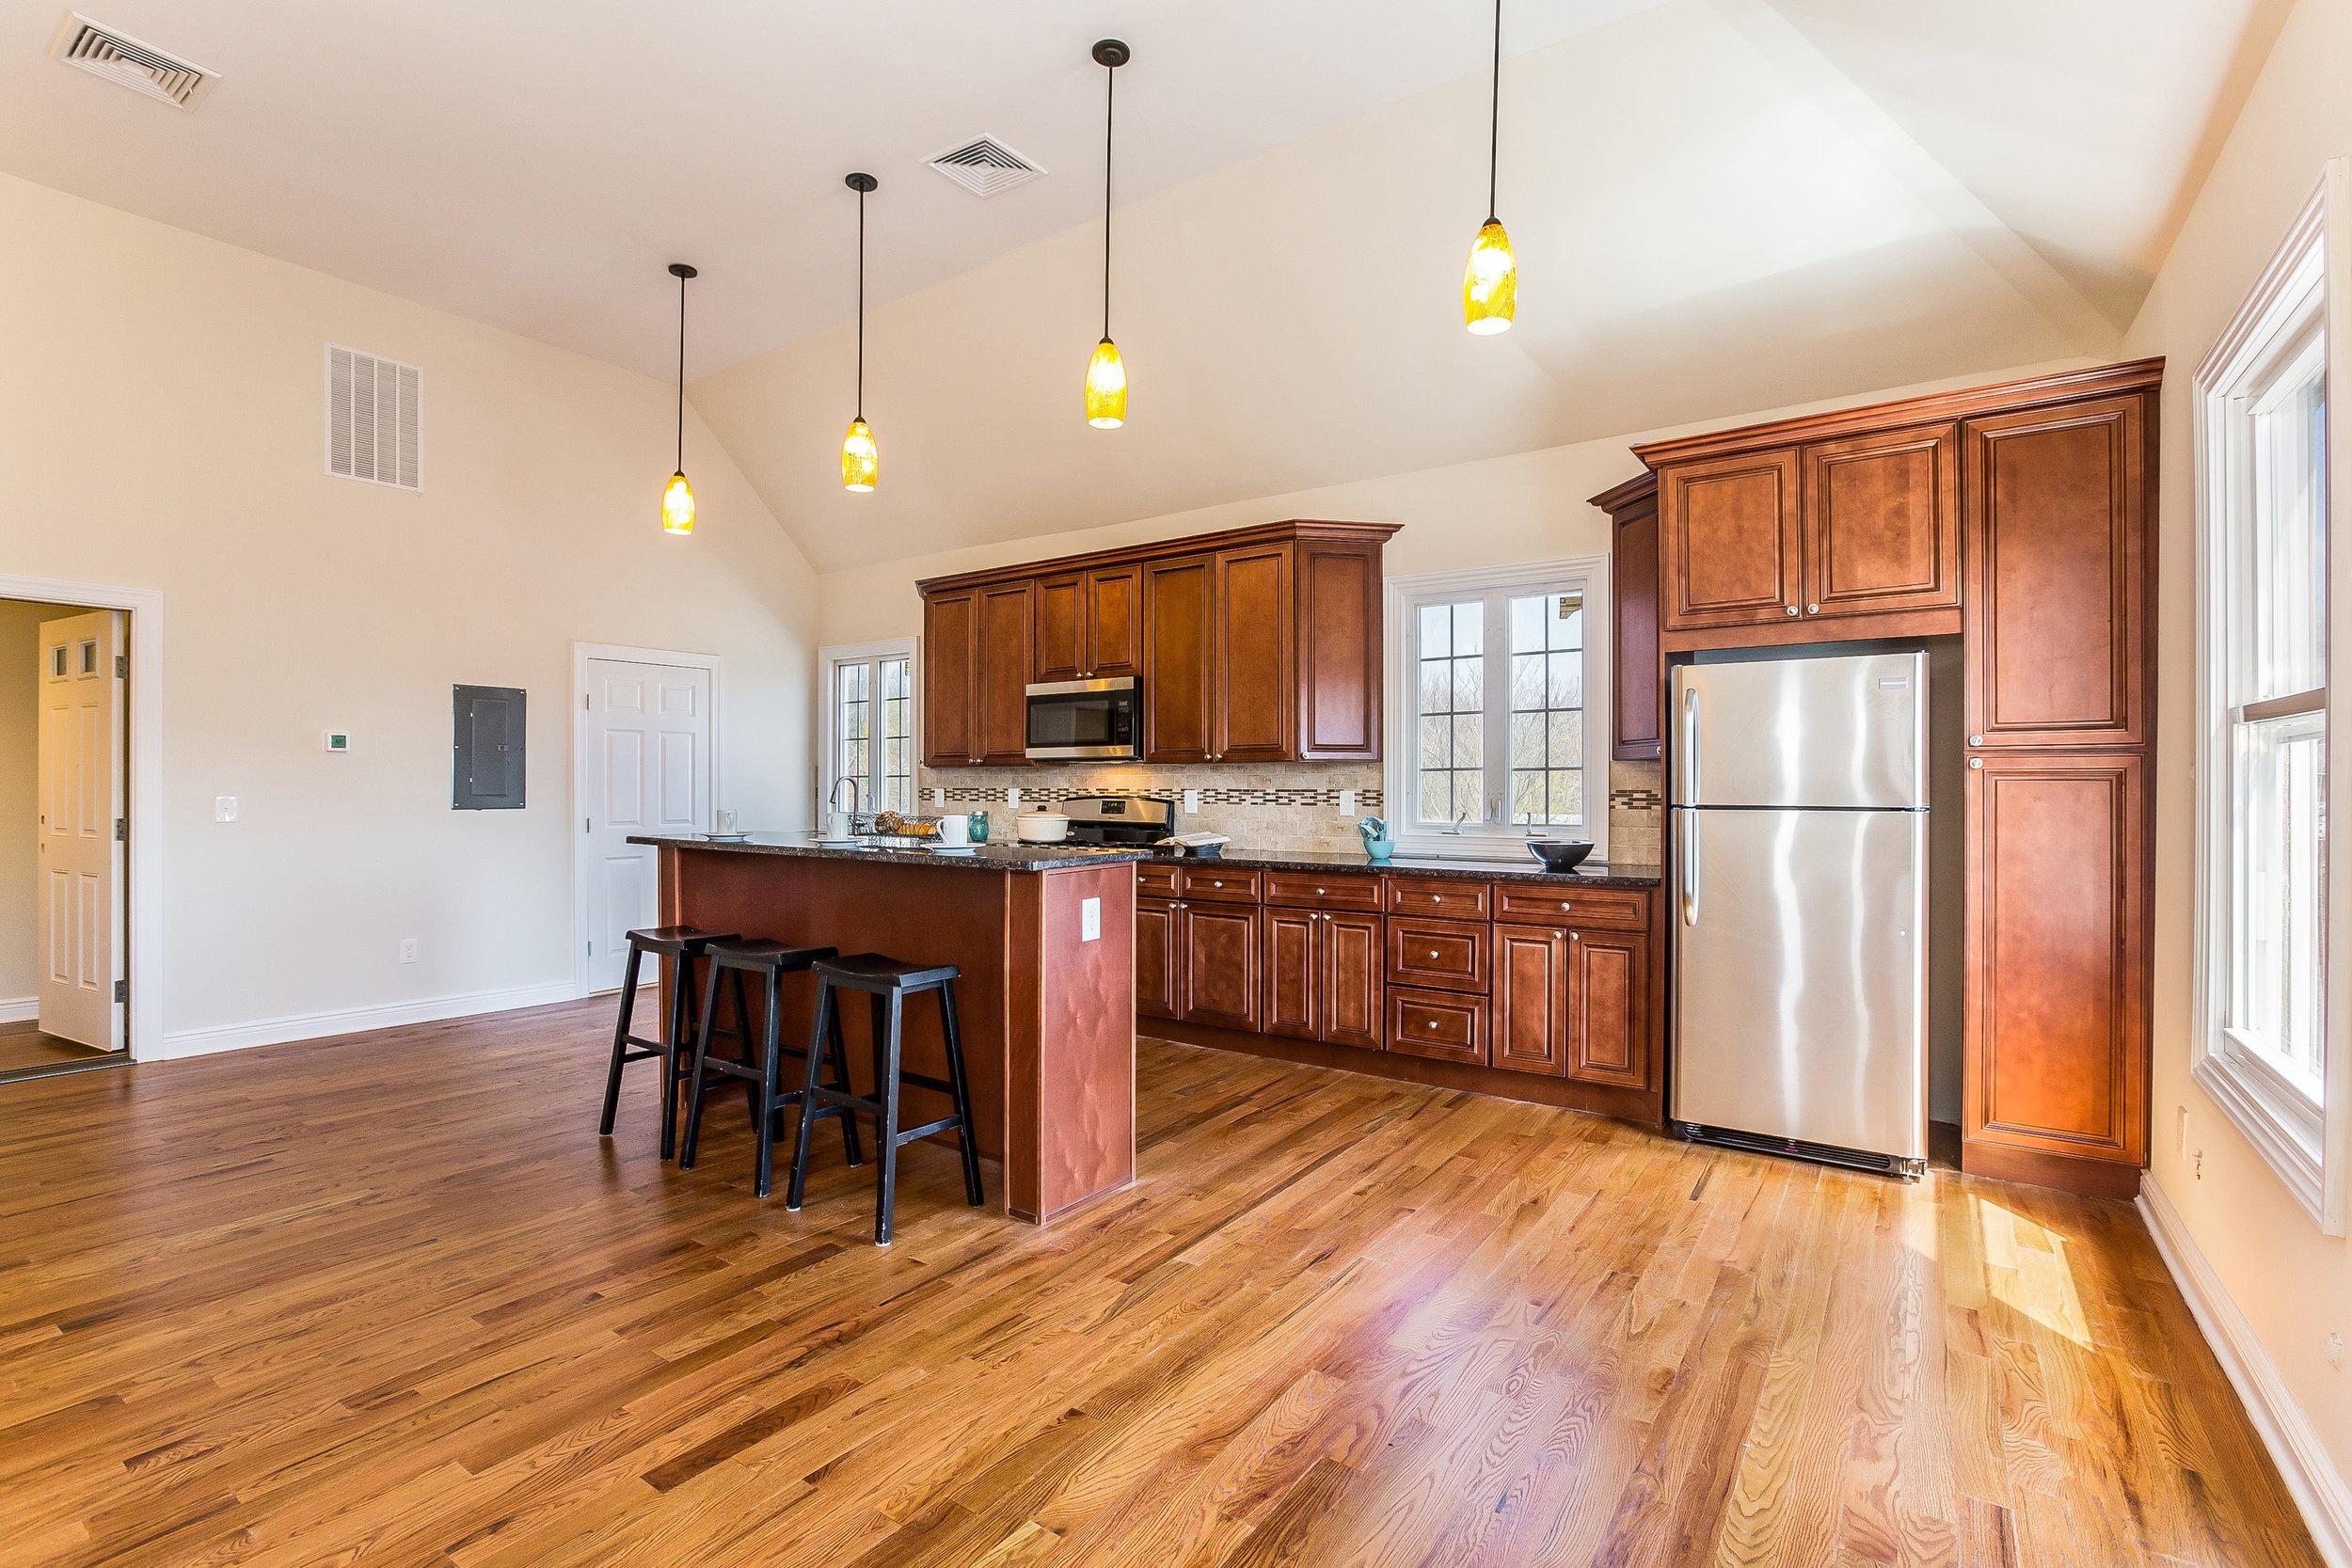 035-Kitchen-3992678-large.jpg